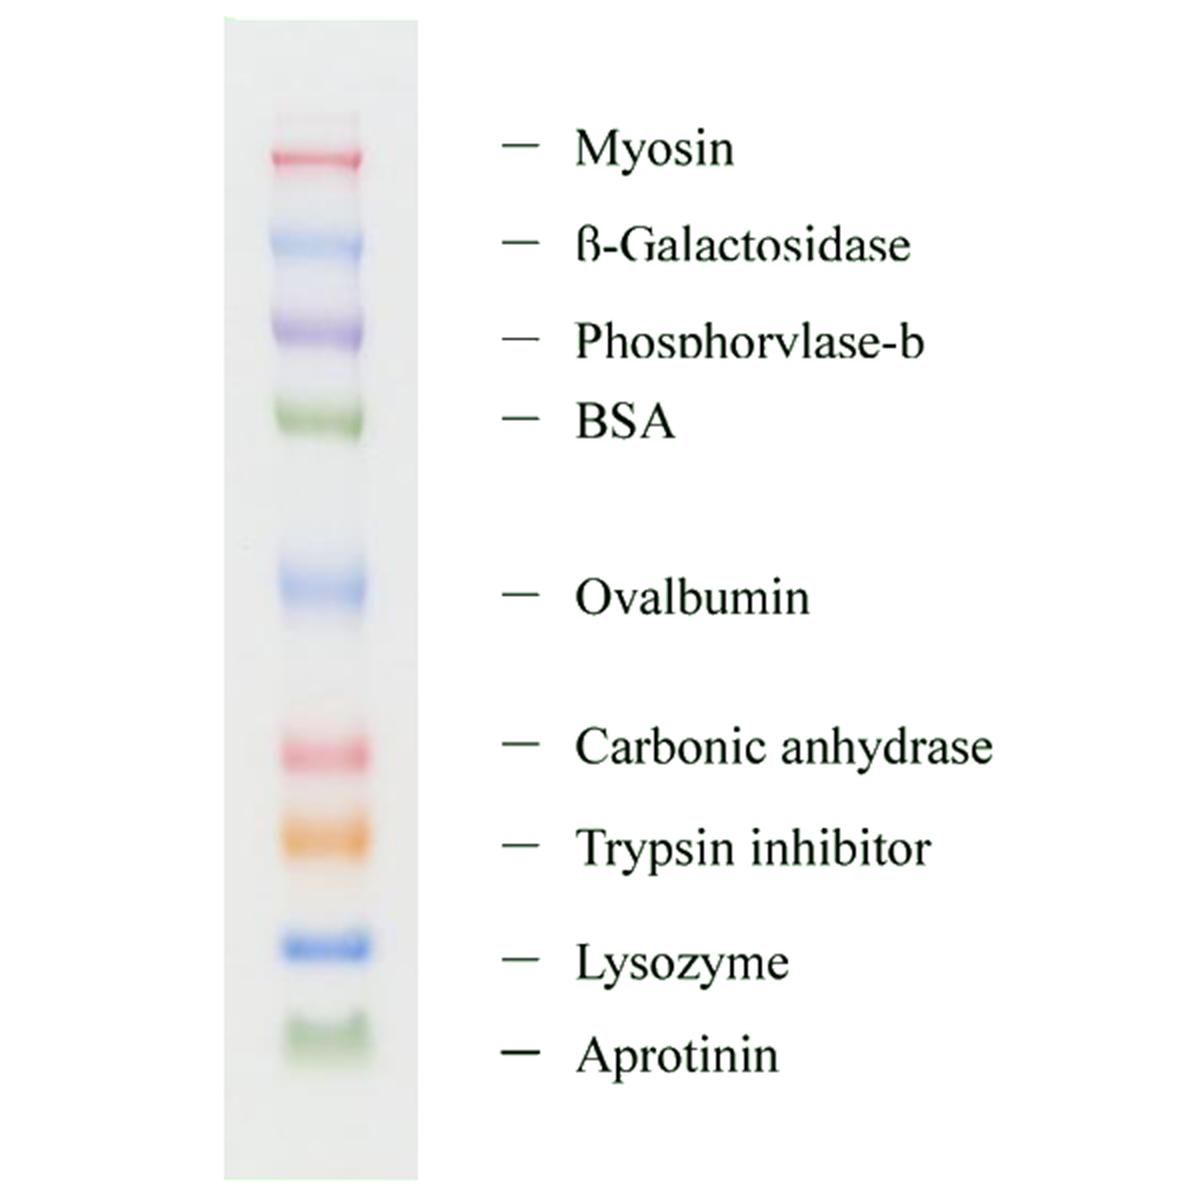 Multi-Color Protein Size Marker by Diagnocine